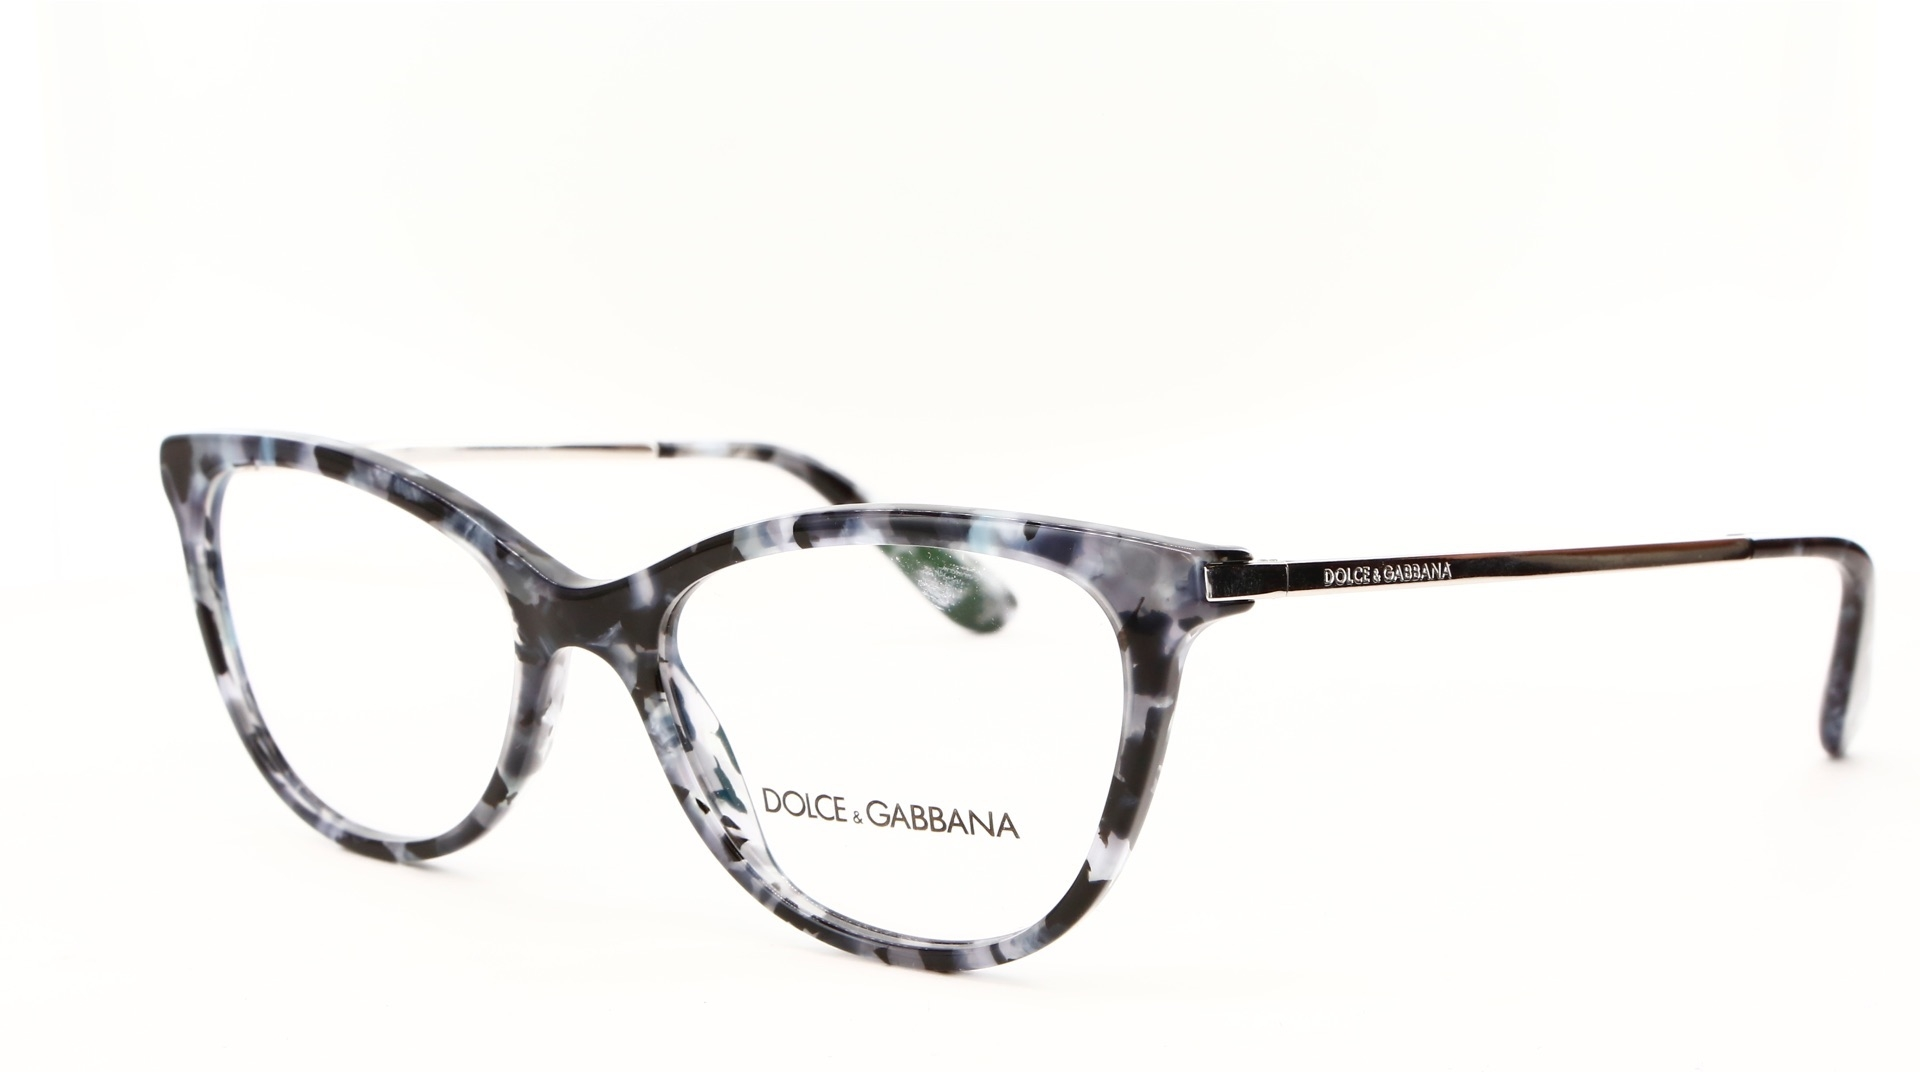 78615 | Dolce & Gabbana Frames | Claeyssens Optic | Brugge & Gent